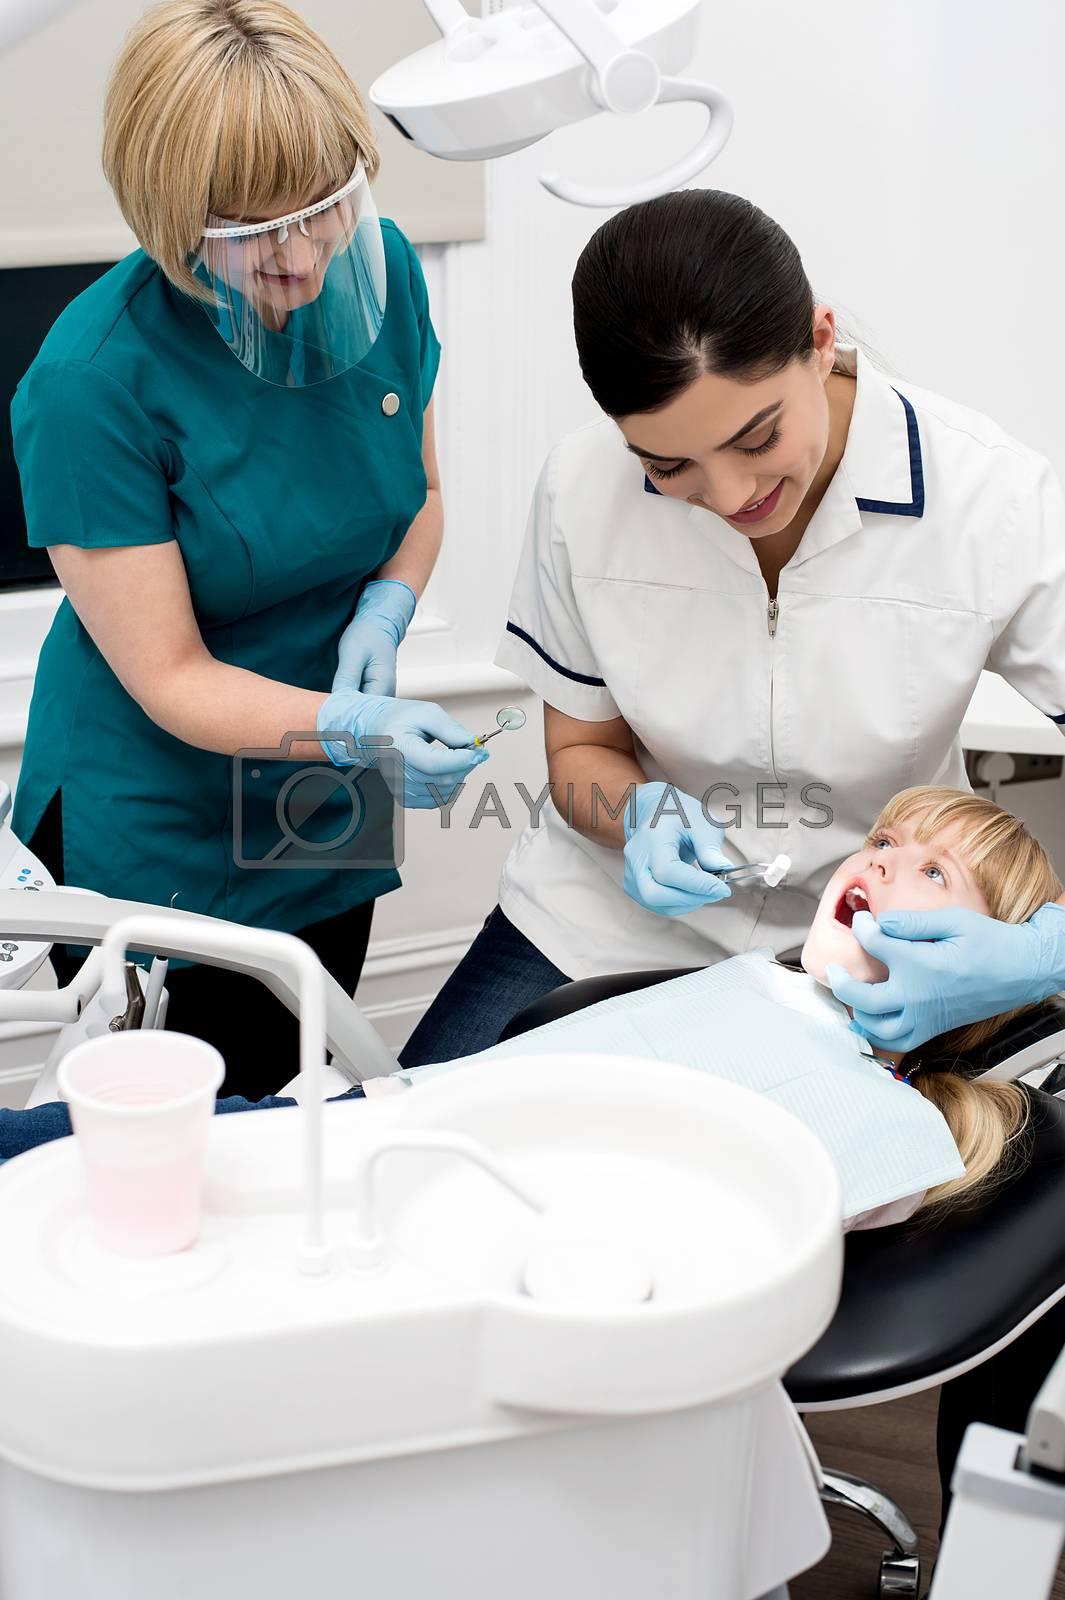 Professional dentist performing a dental procedure